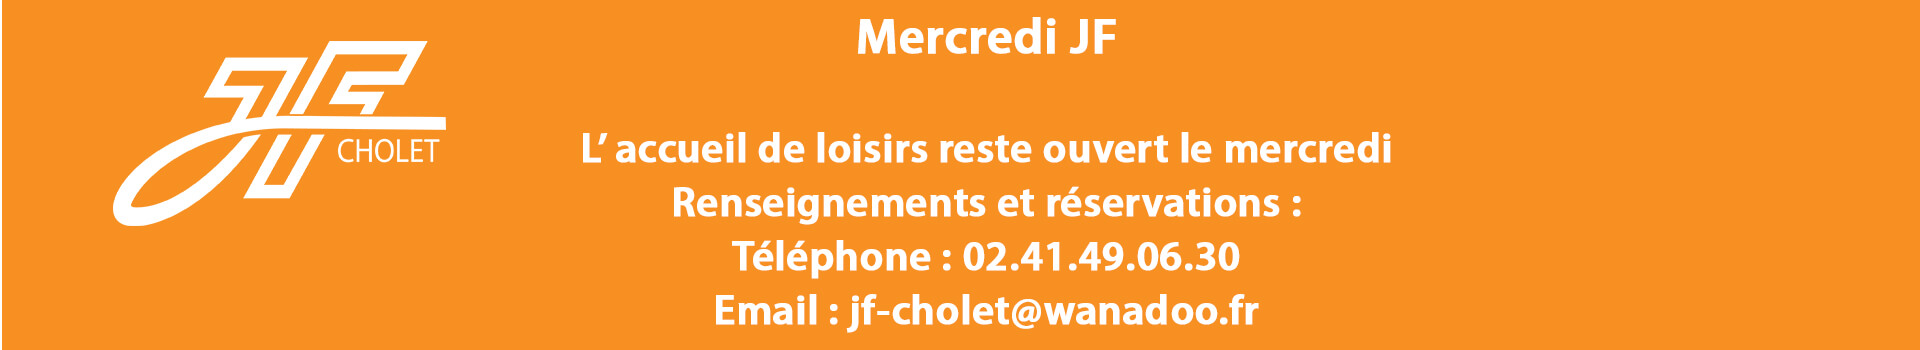 bandeau_accueil-de-loisirs-mercredi_20-21